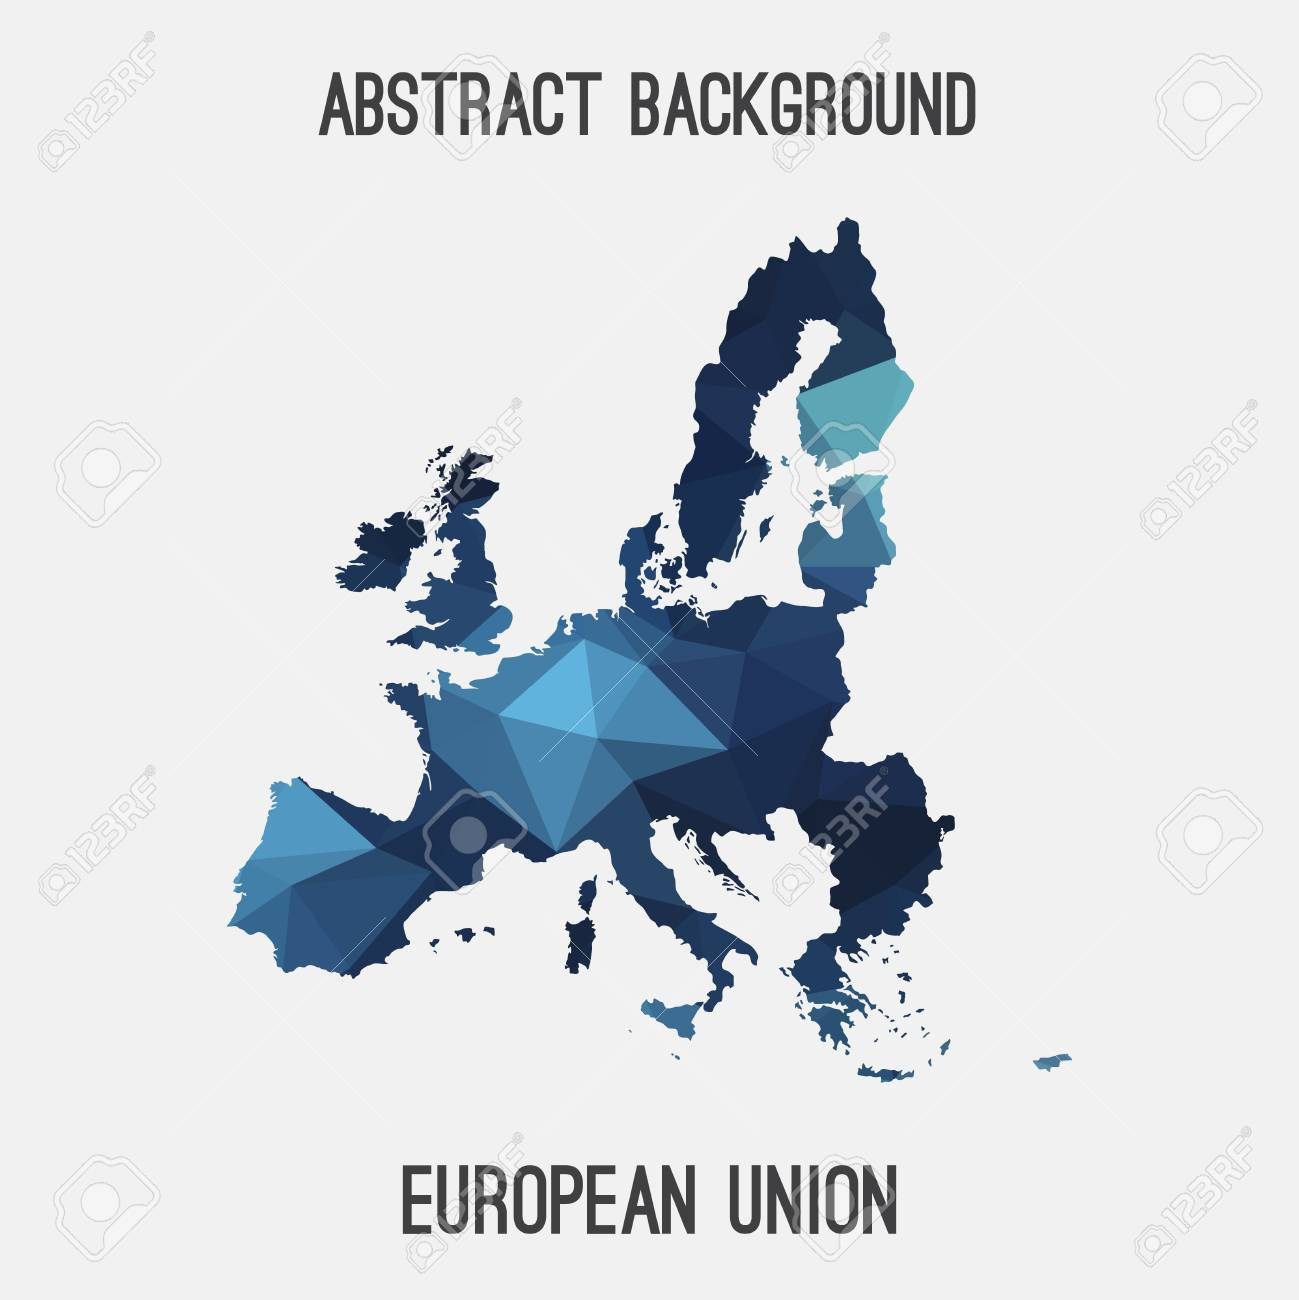 European Union Eu Map In Geometric Polygonal Mosaic Style Abstract